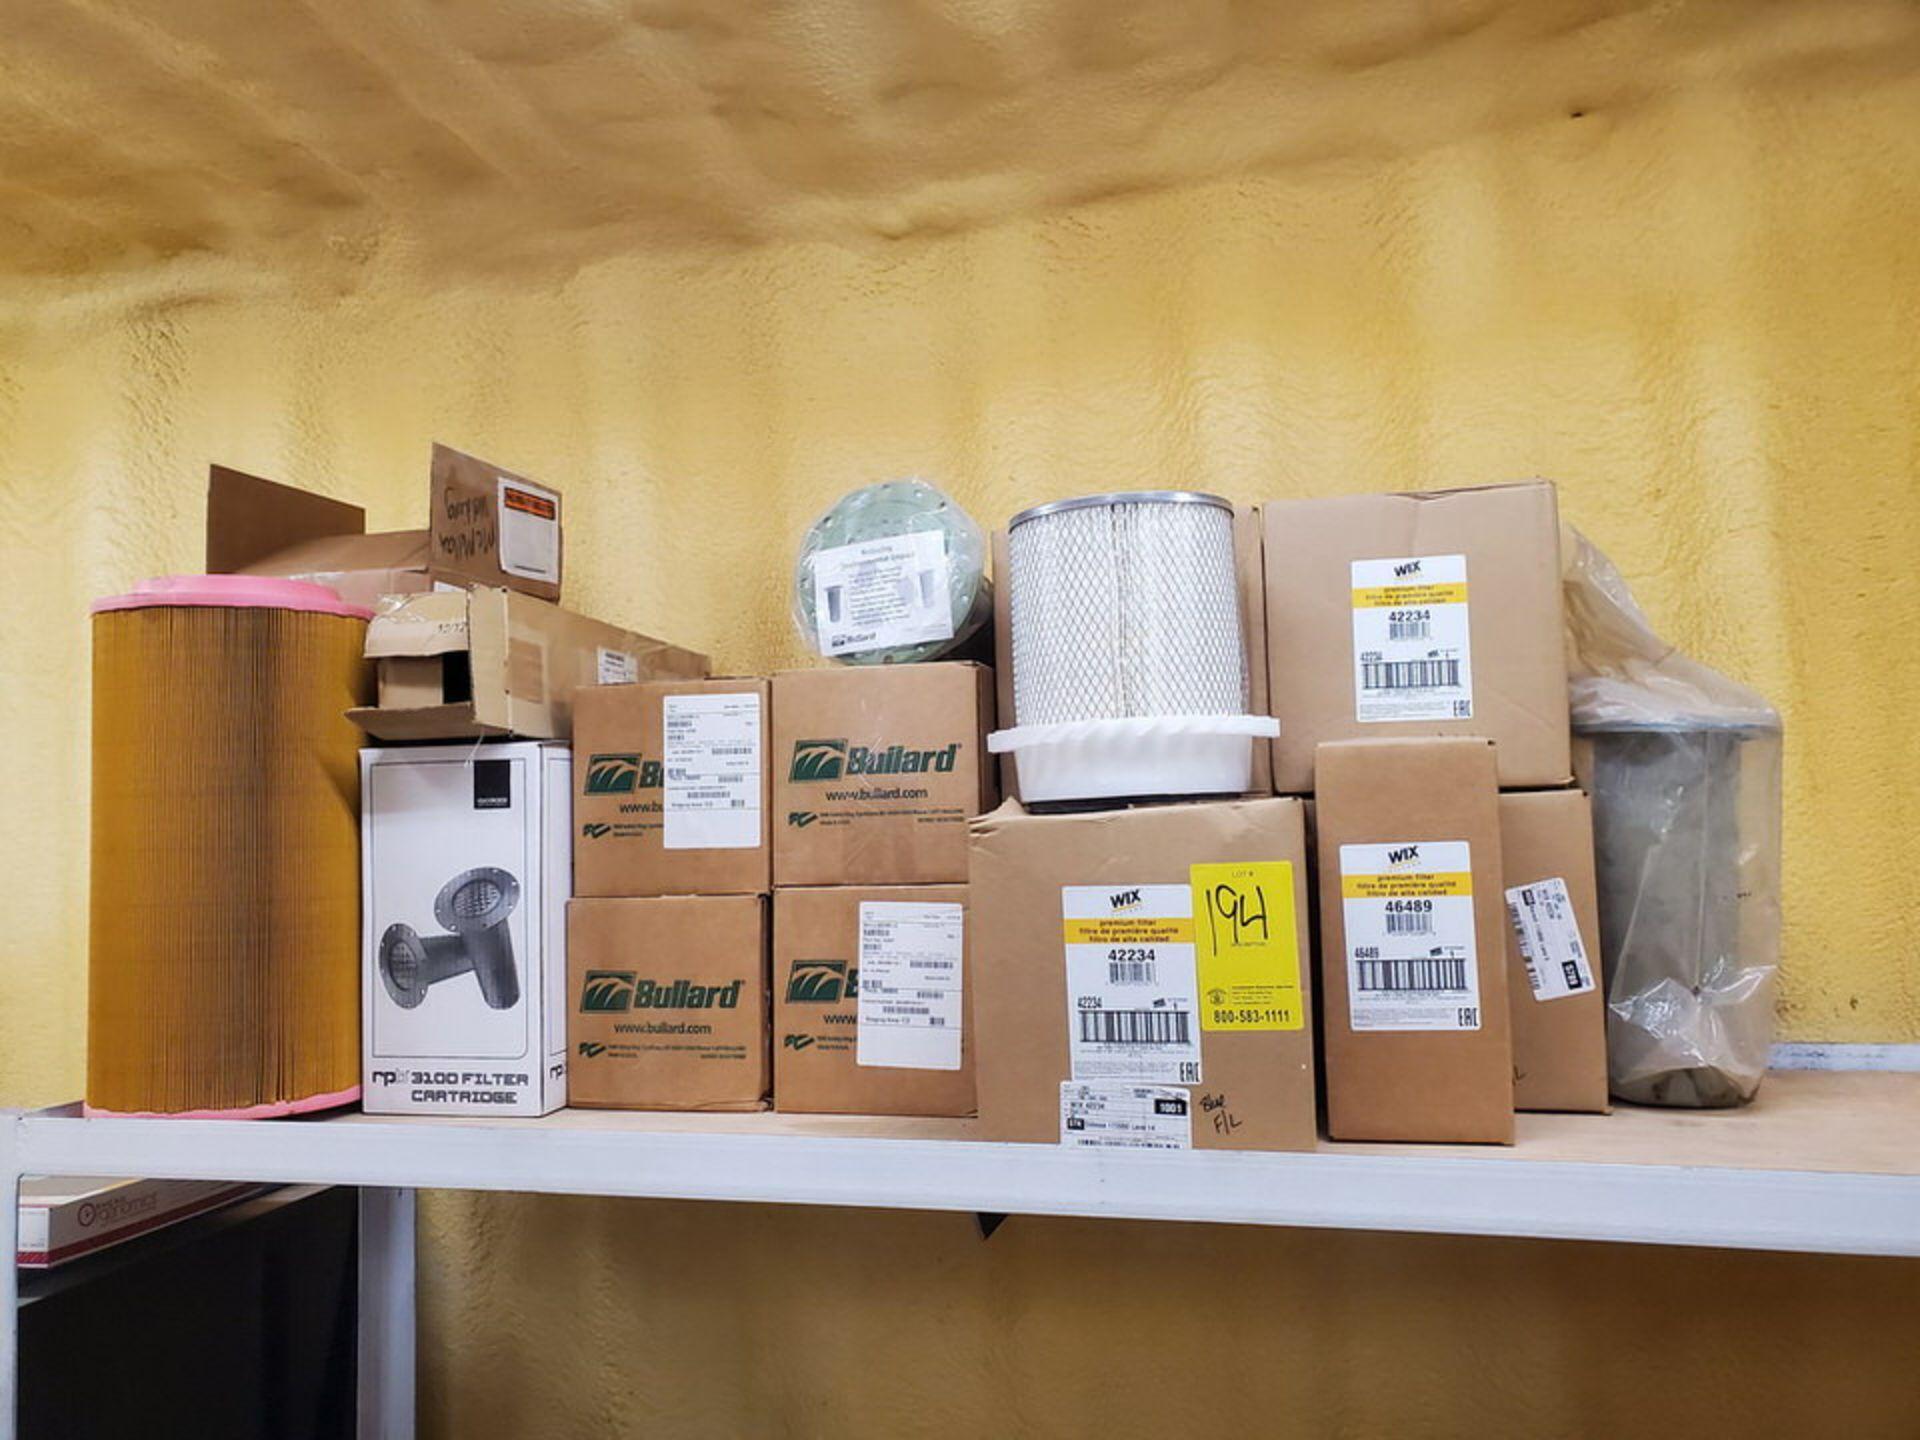 Assorted Filters Mfg's: Bullard, Wix & Other